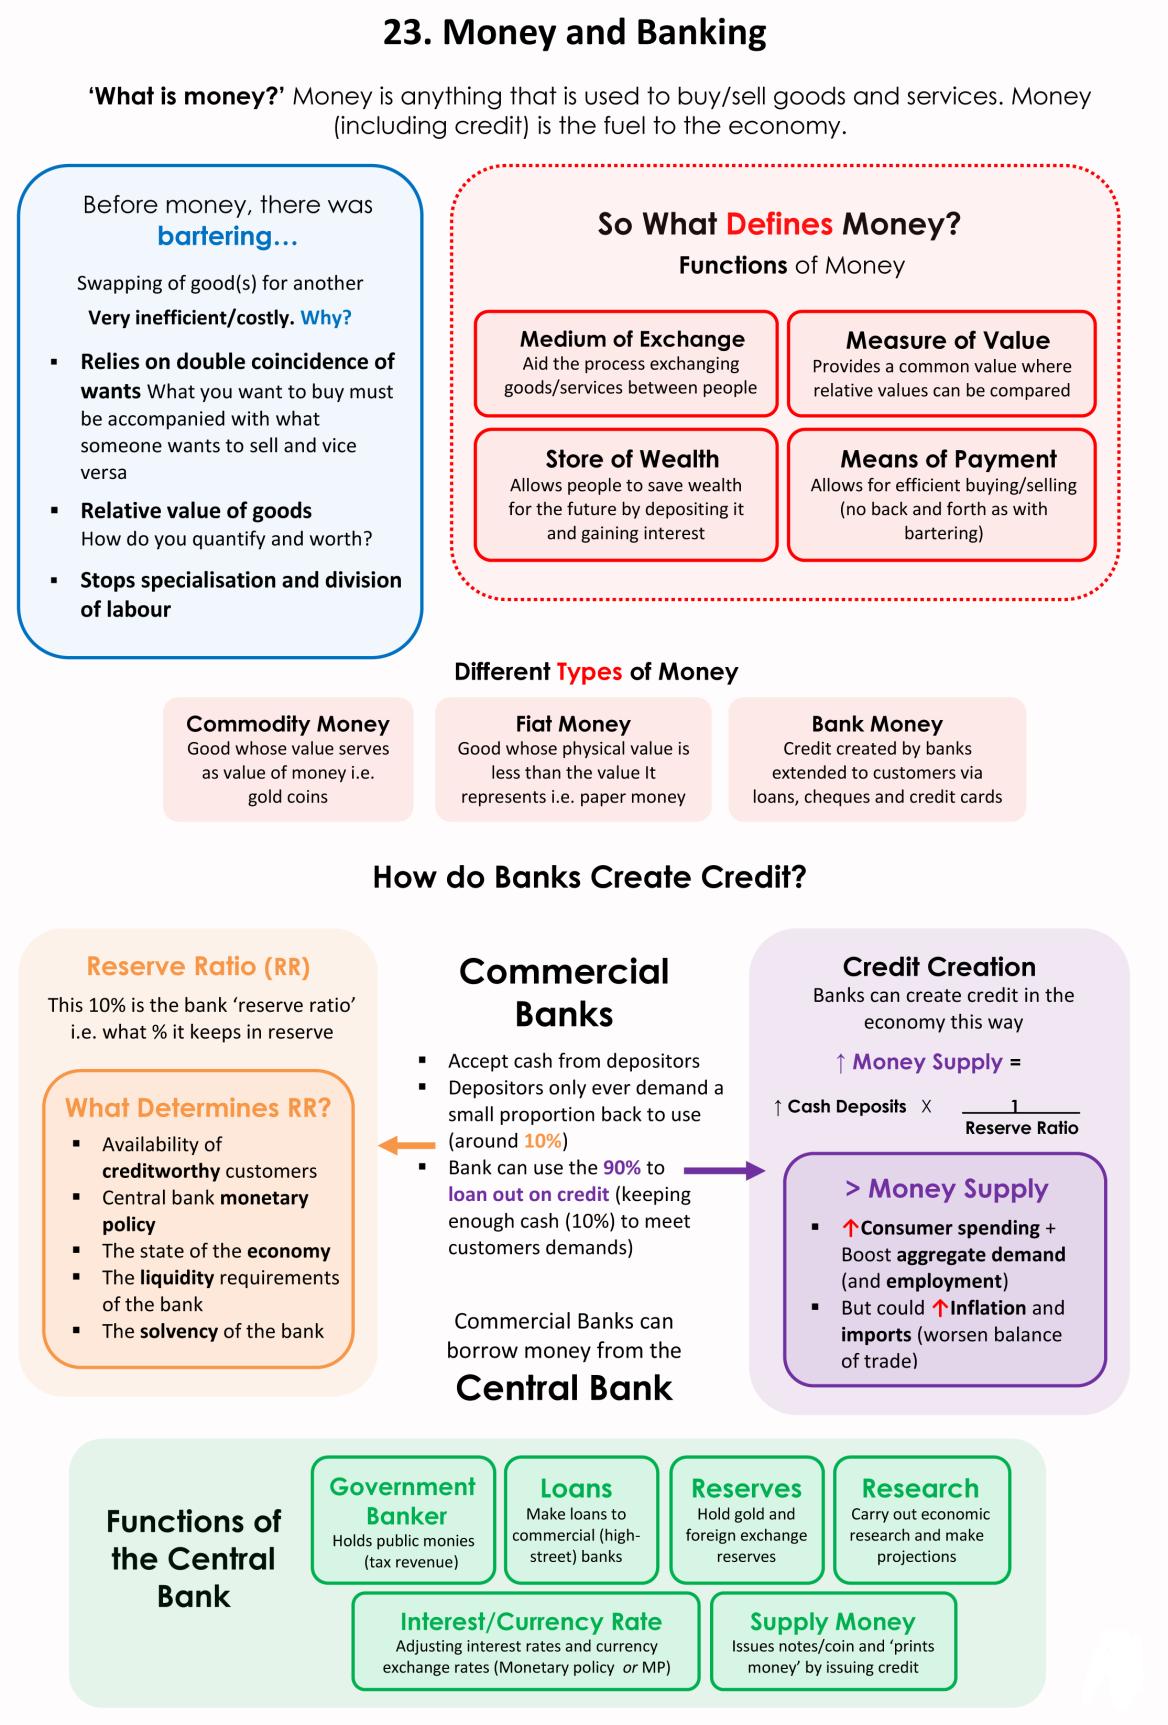 23 Money And Banking Economics Lessons Learn Economics Economics